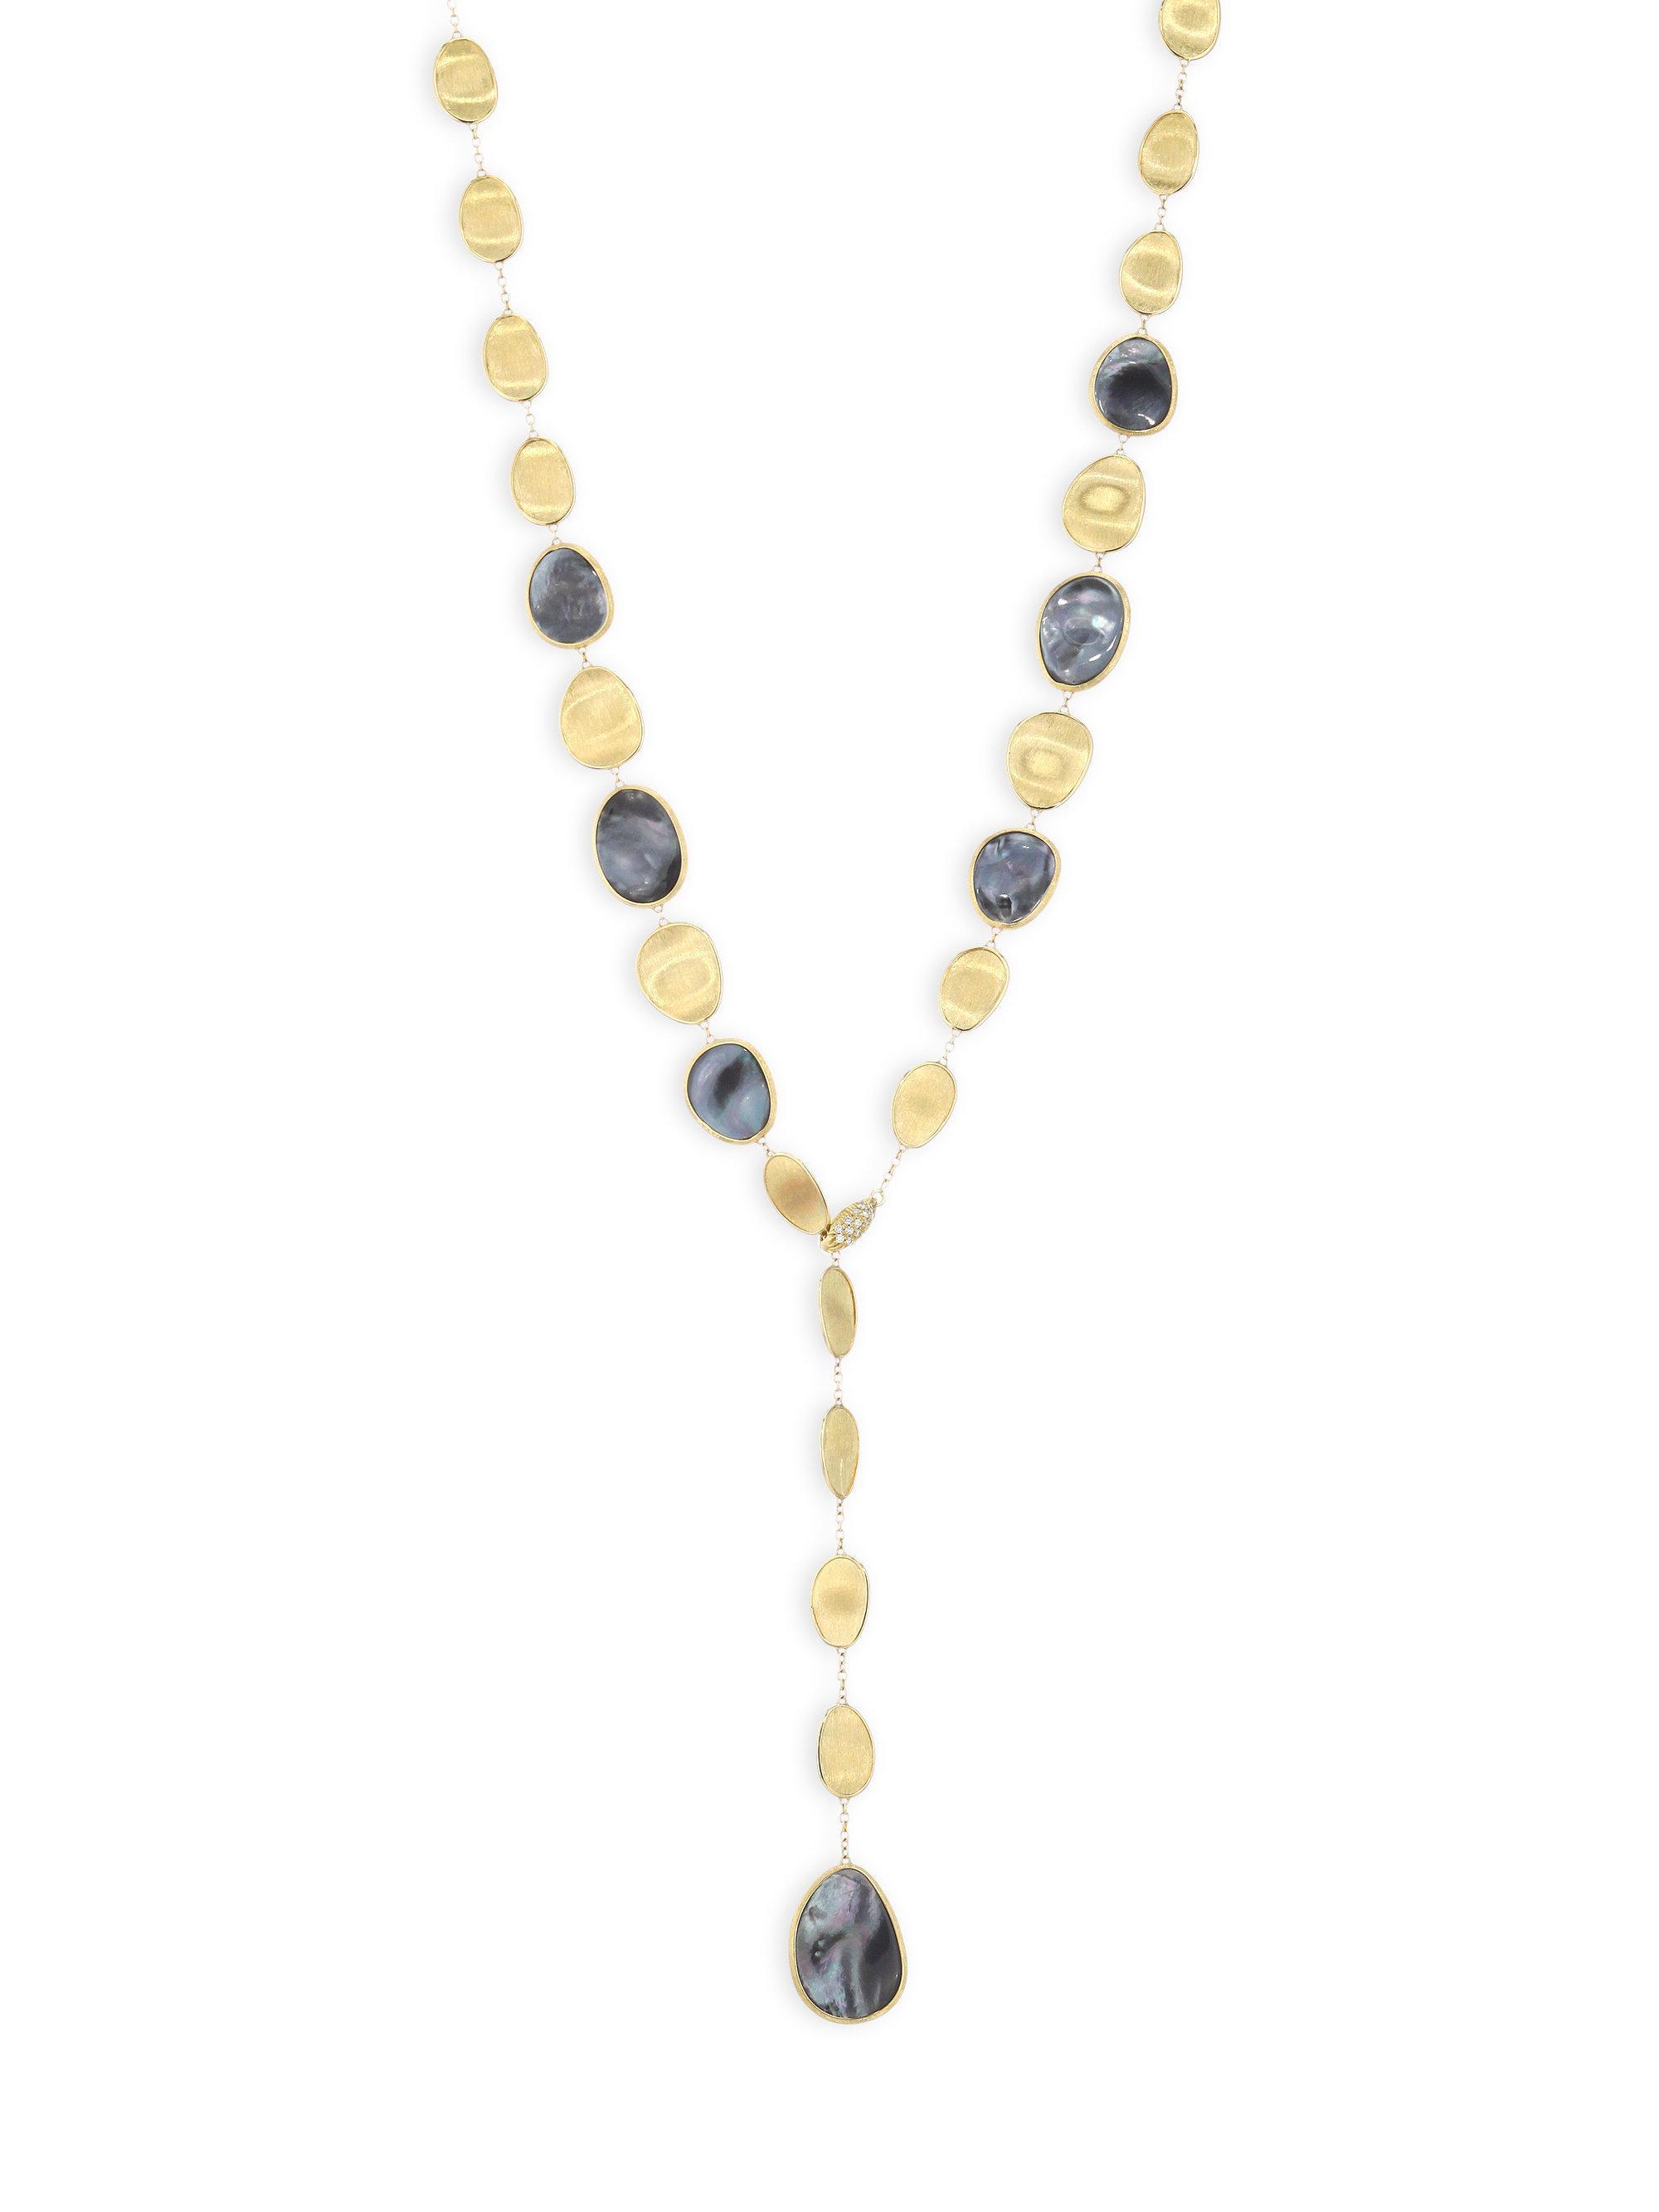 Marco Bicego Lunaria 18k Black Mother-of-Pearl Station Necklace pz2okCJ